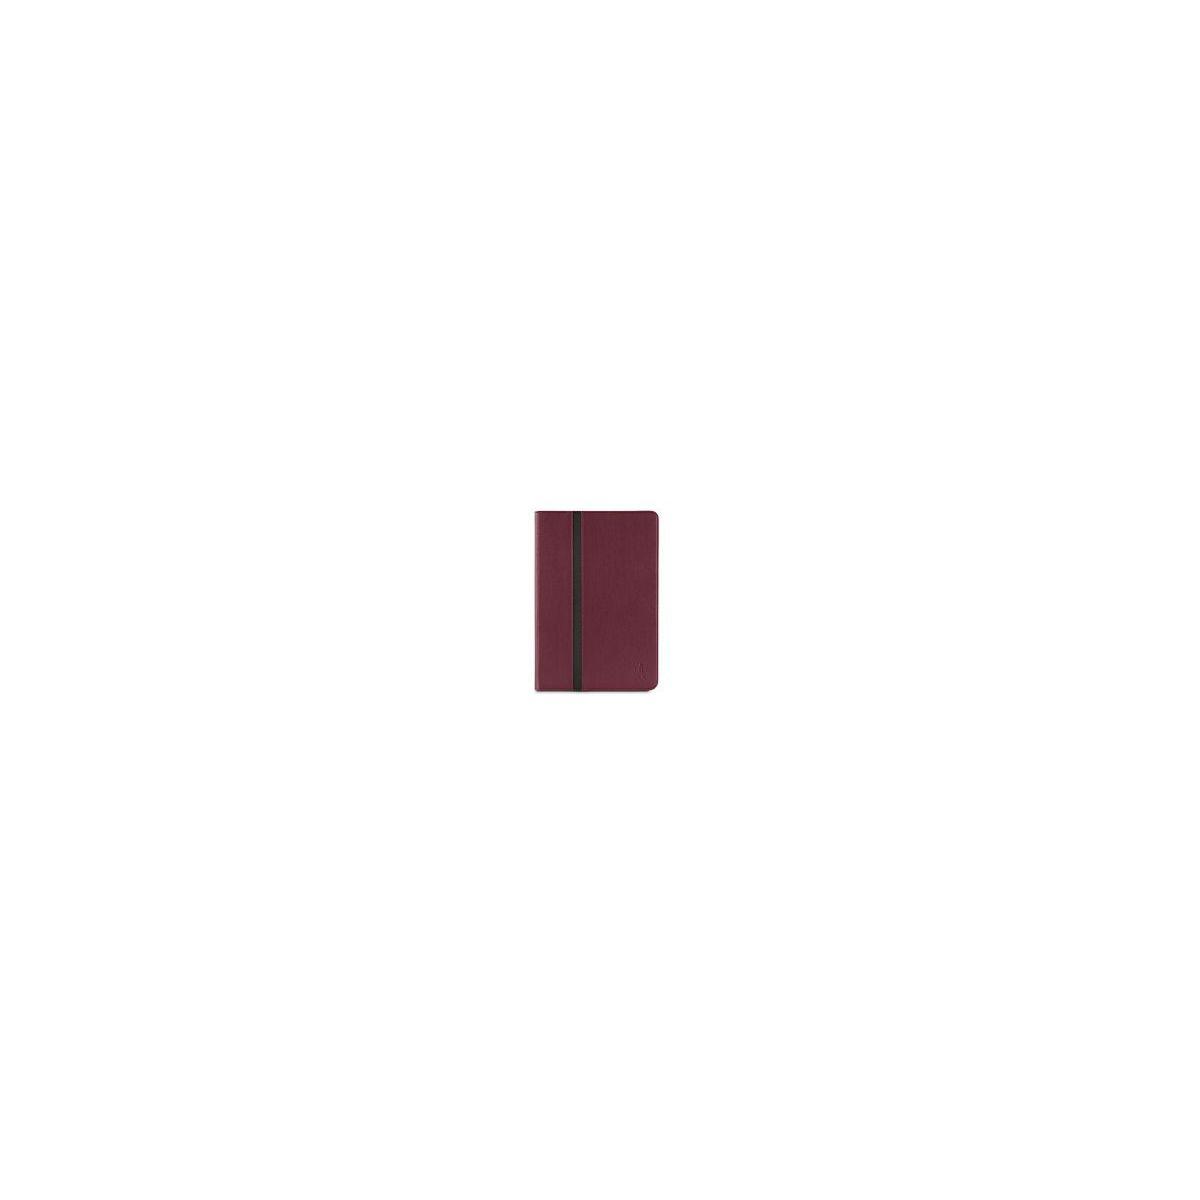 Folio belkin galaxy tab 4 10'' form-fit bordeau - 20% de remise immédiate avec le code : multi20 (photo)